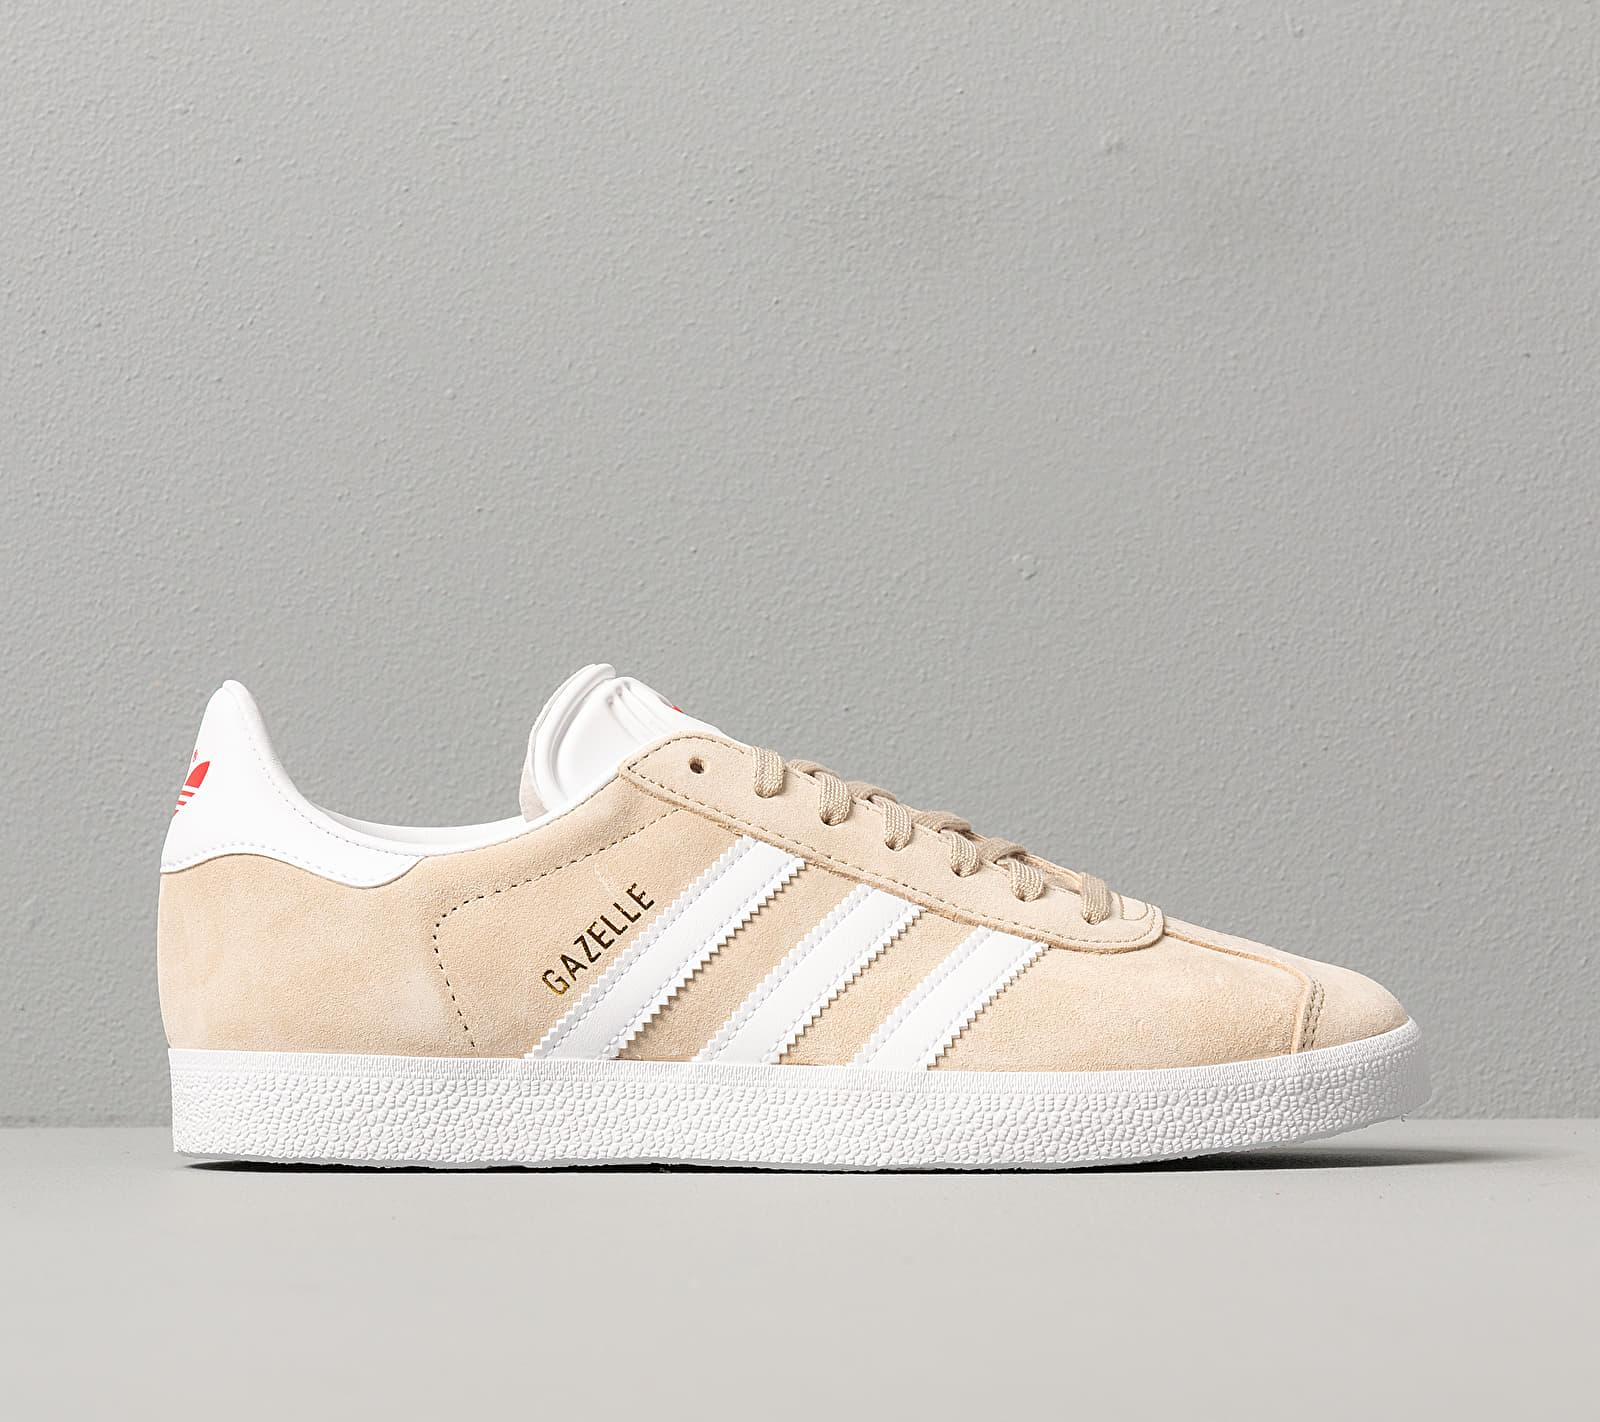 Adidas Gazelle W Savanna/ Ftw White/ Glow Red